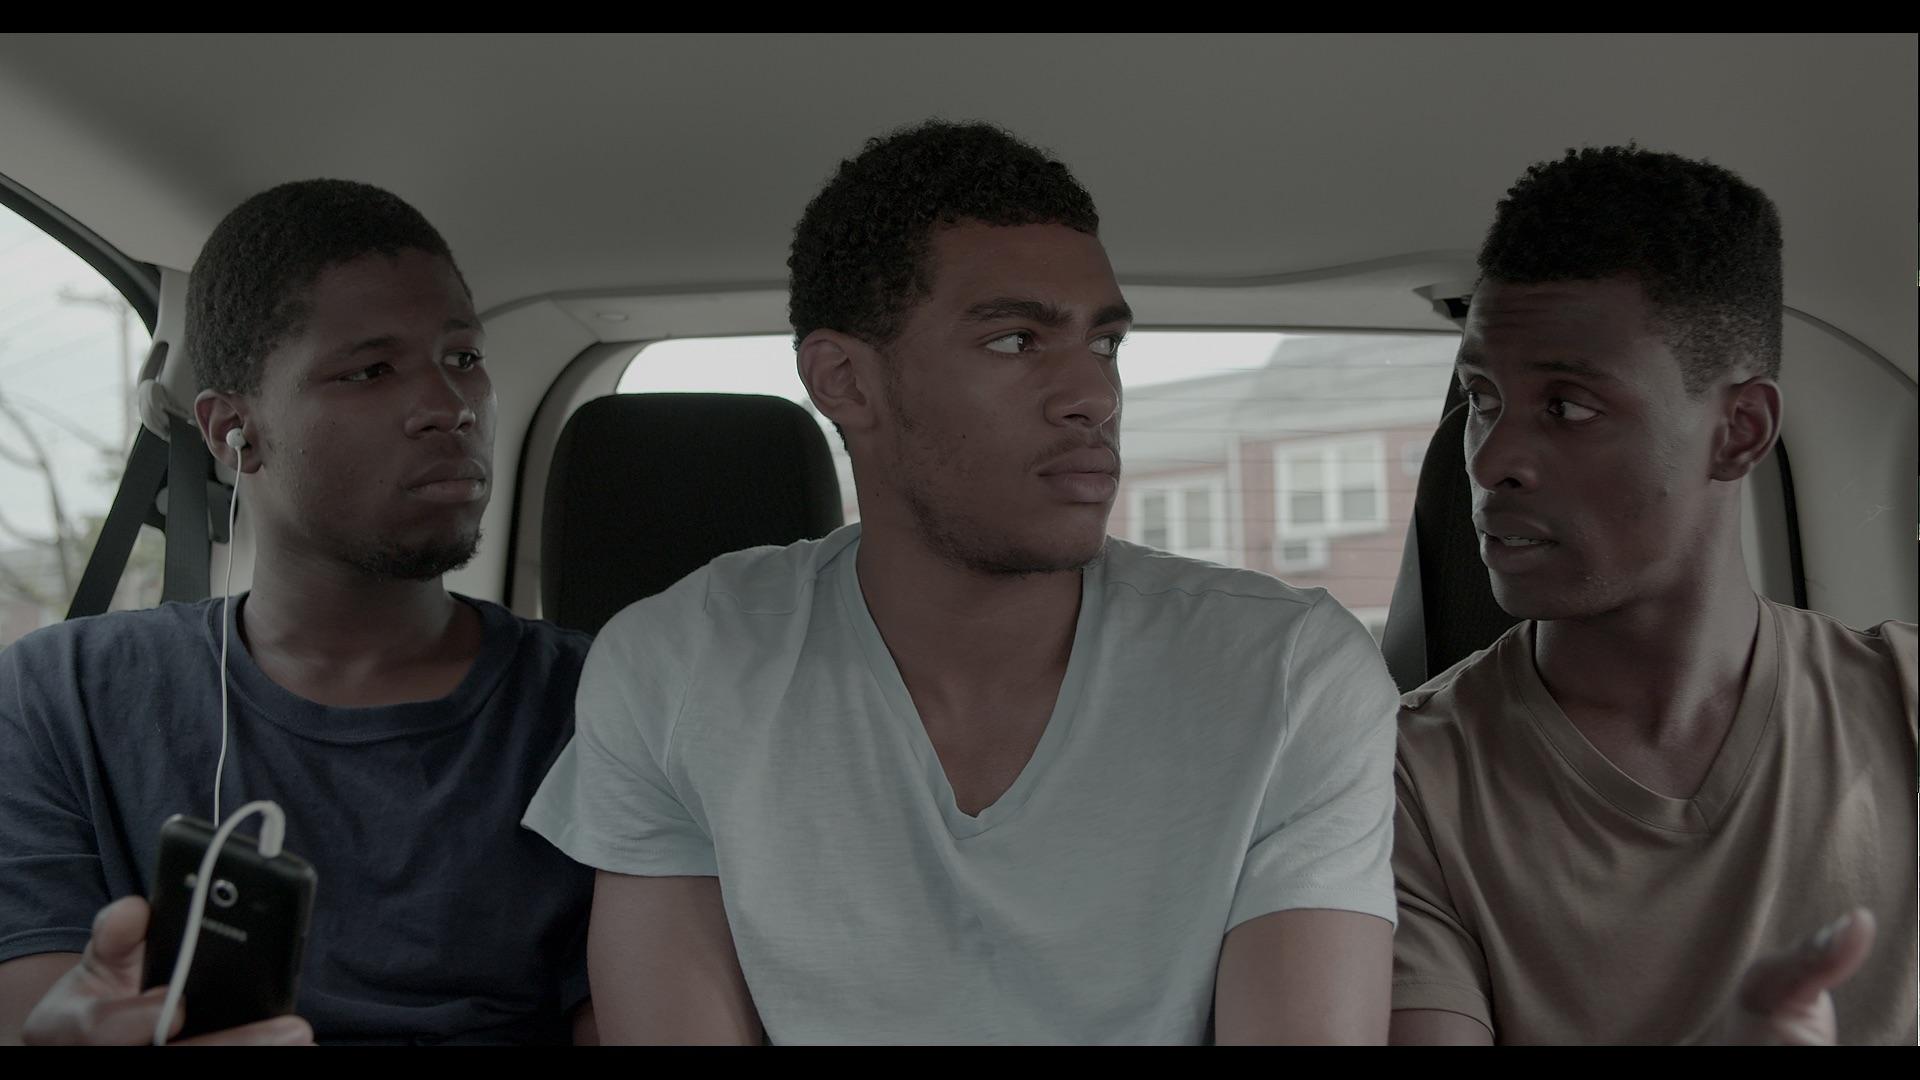 Actors: Jakeem Powell, Leo Bona-Balibar and Andre Ozim